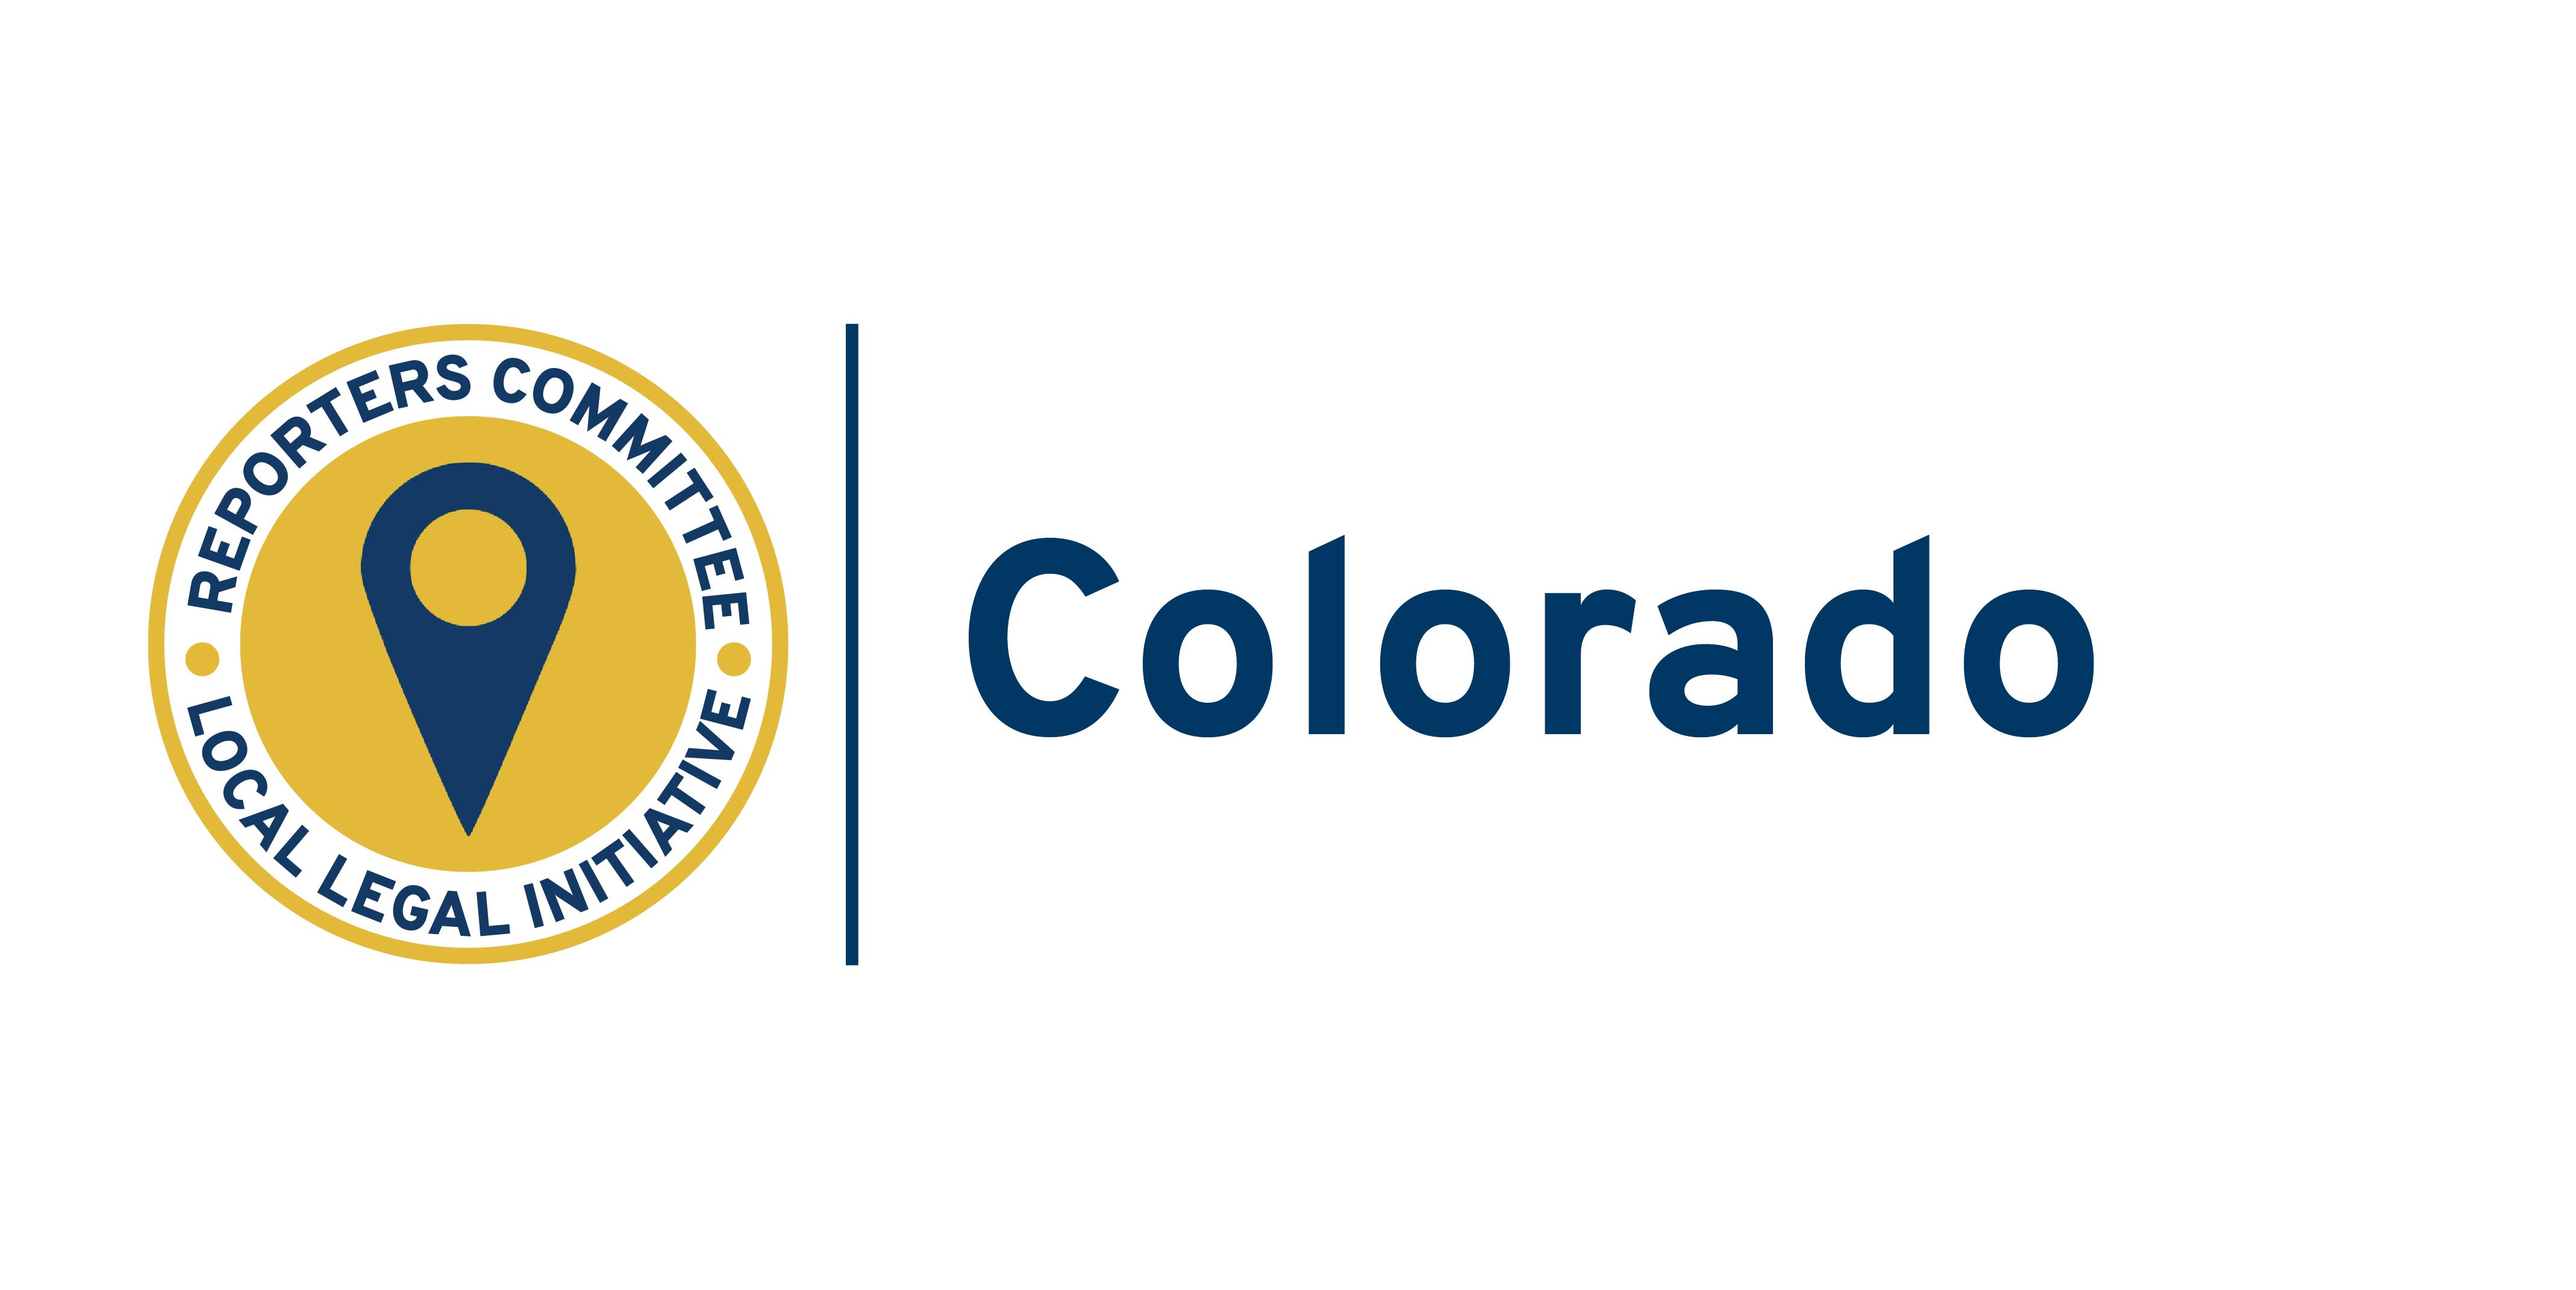 State name card for Colorado Local Legal Initiative